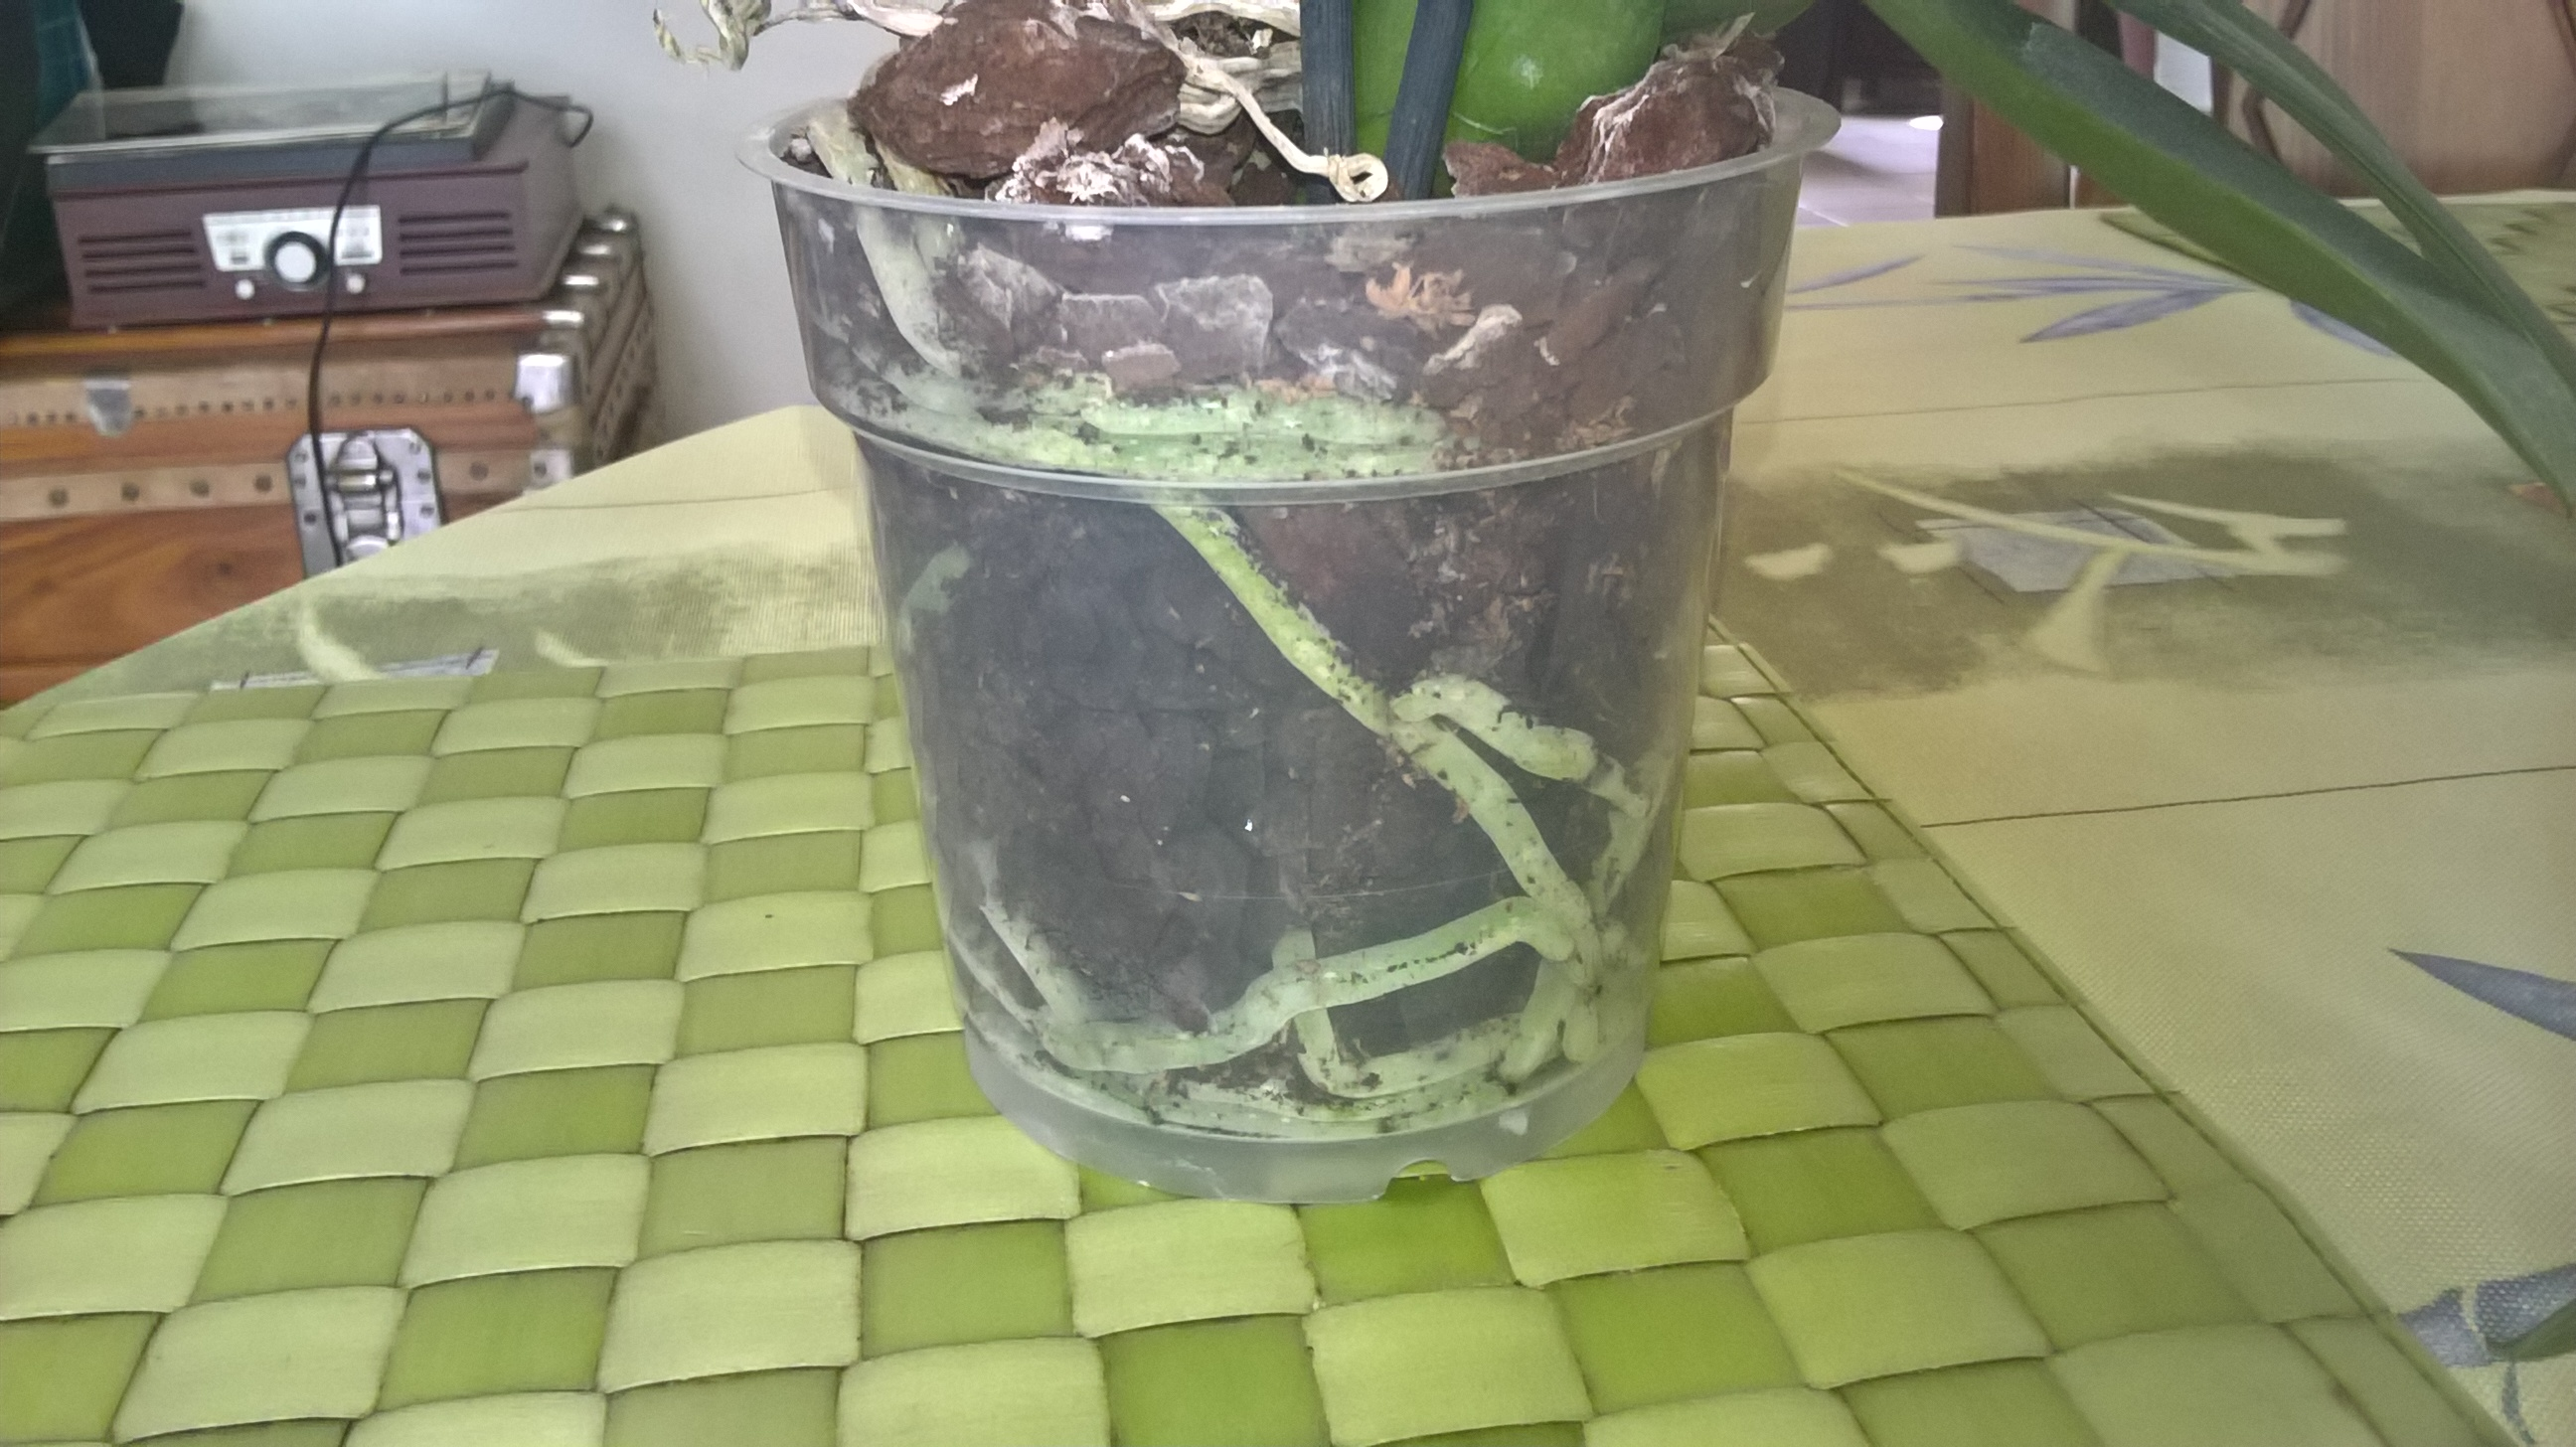 phalaenopsis défleuries  - Page 2 469751WP20160730112719Pro